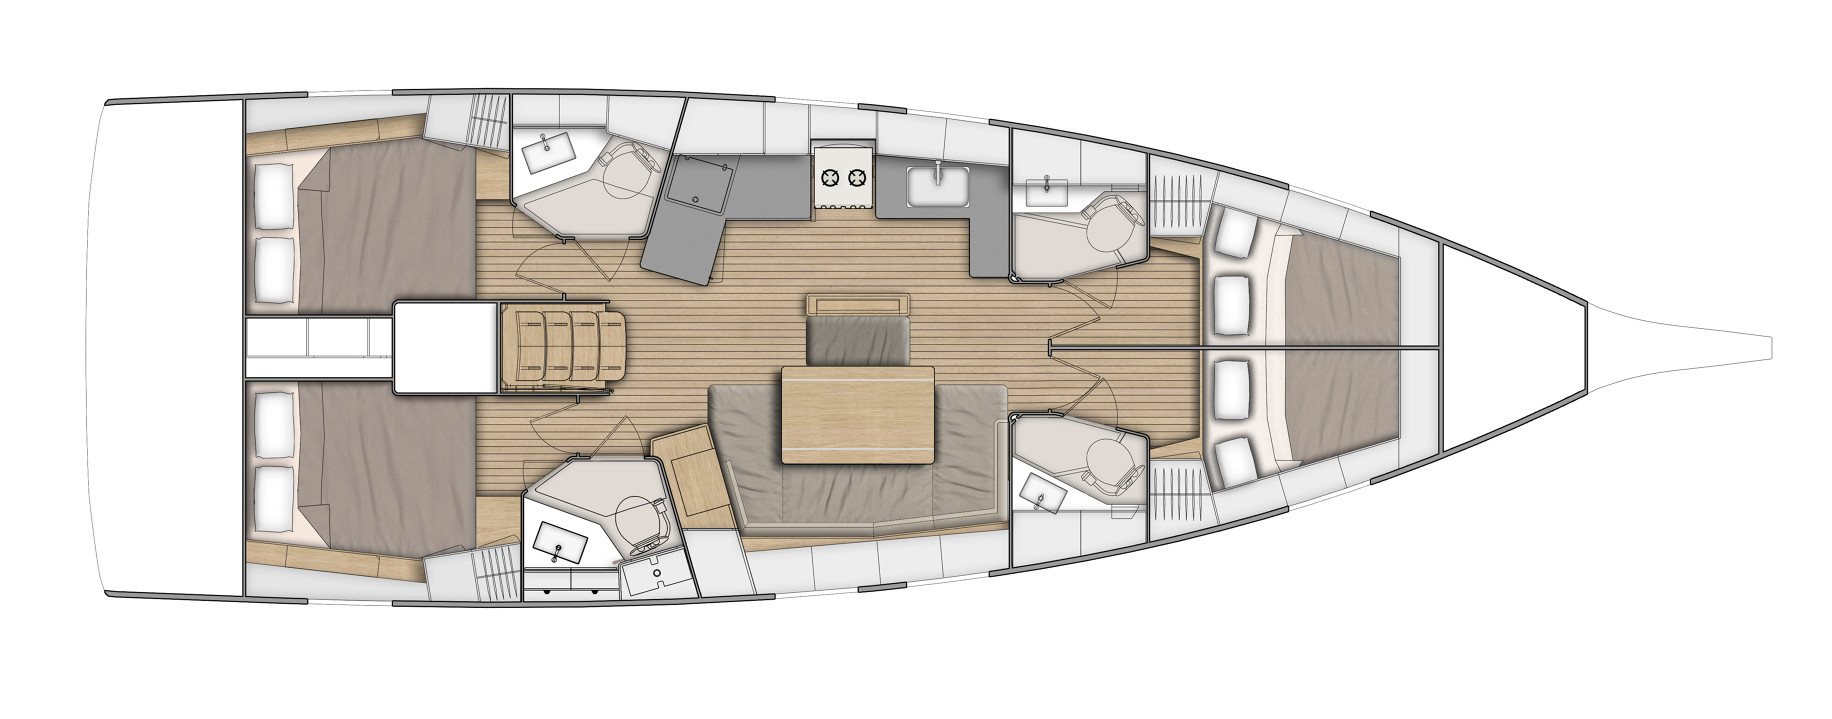 oc46-layout-4c-4t.jpg-1832px